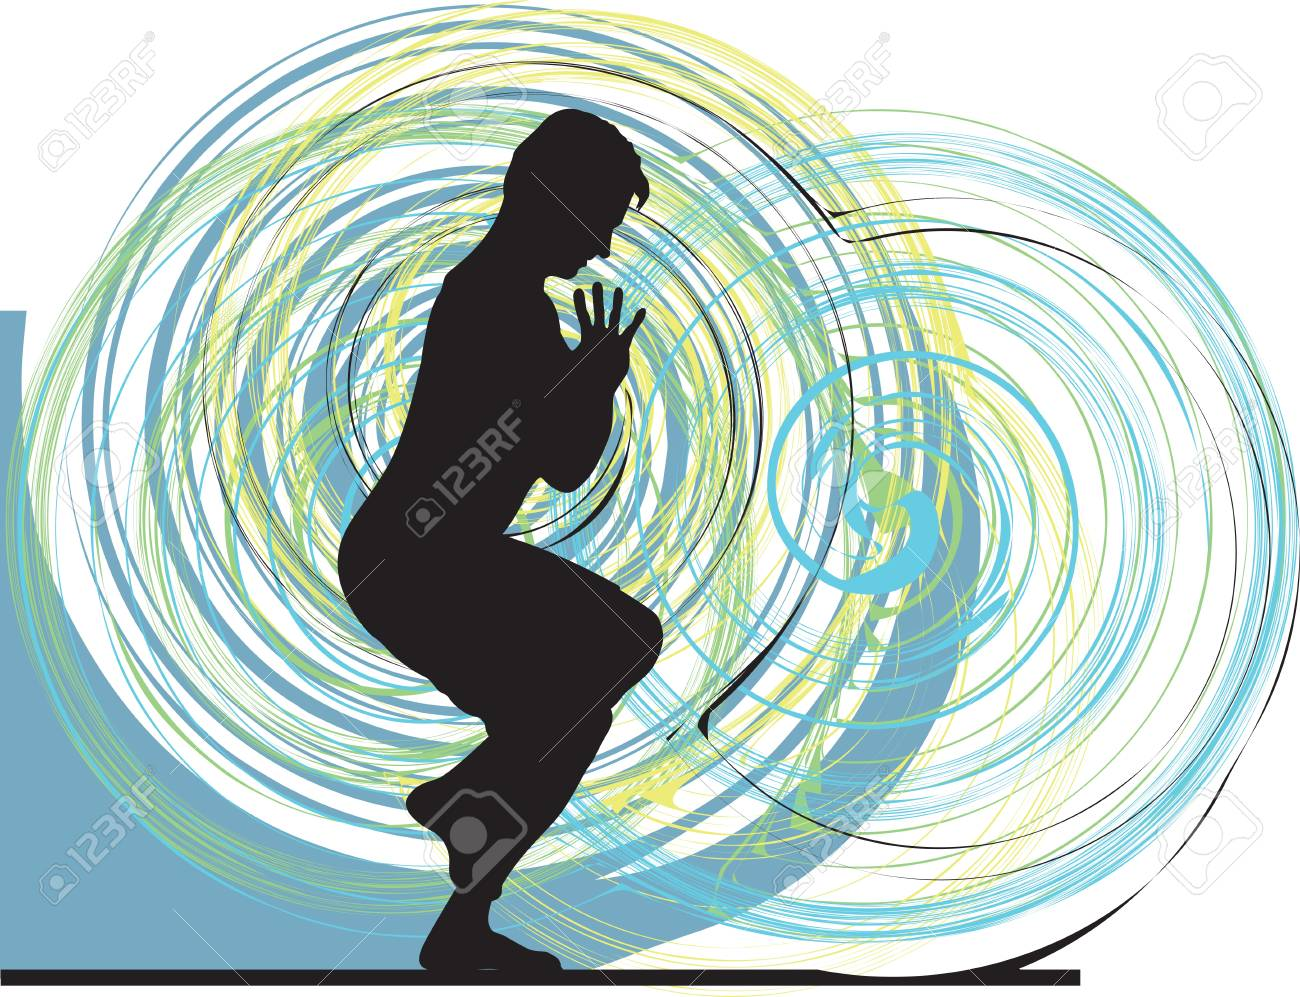 Yoga illustration Stock Vector - 11062468